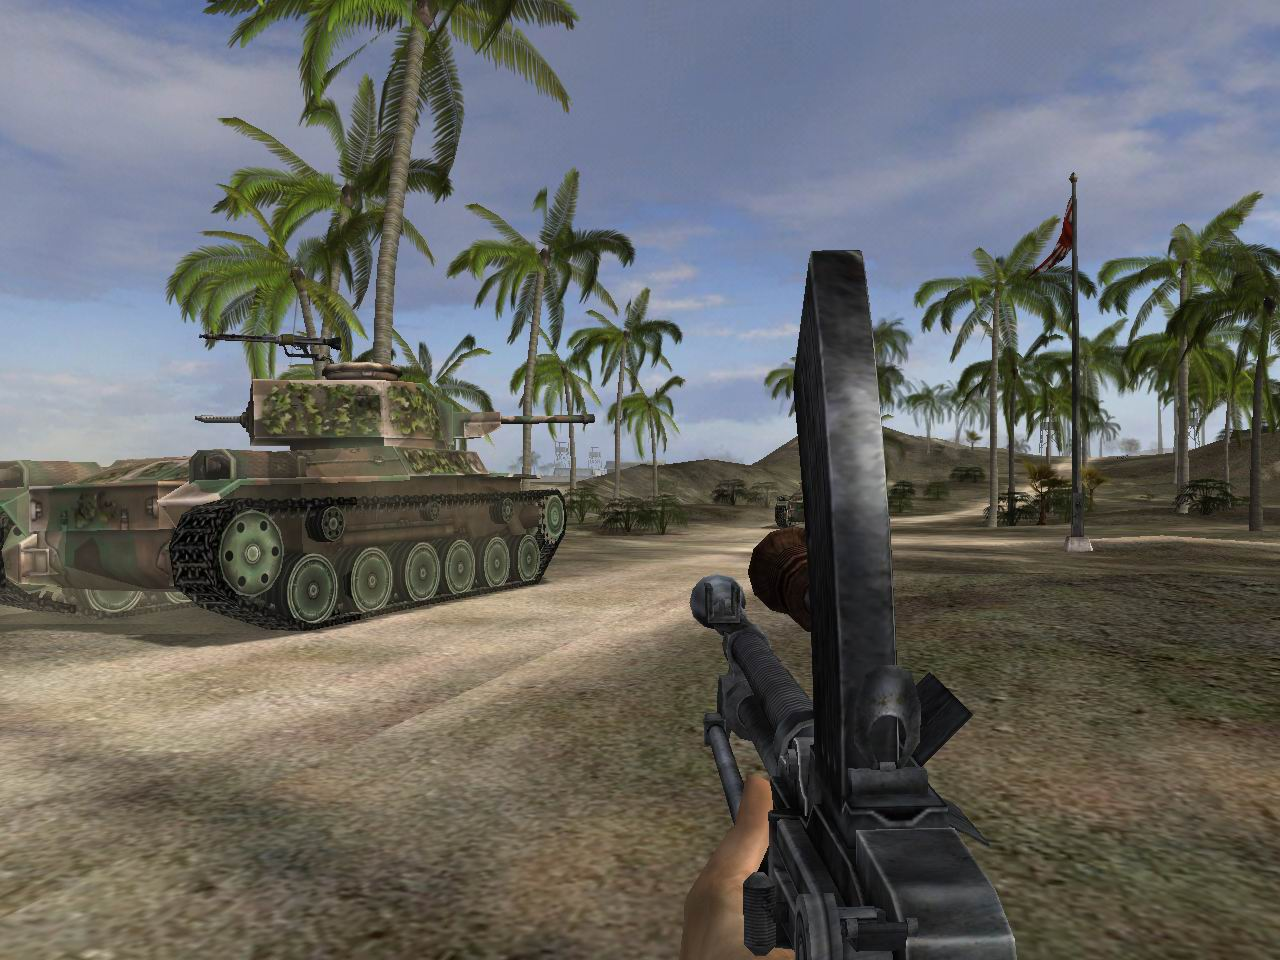 ... download. Downloads > Demo Versions GTA San Andreas Hot Coffee (Adult